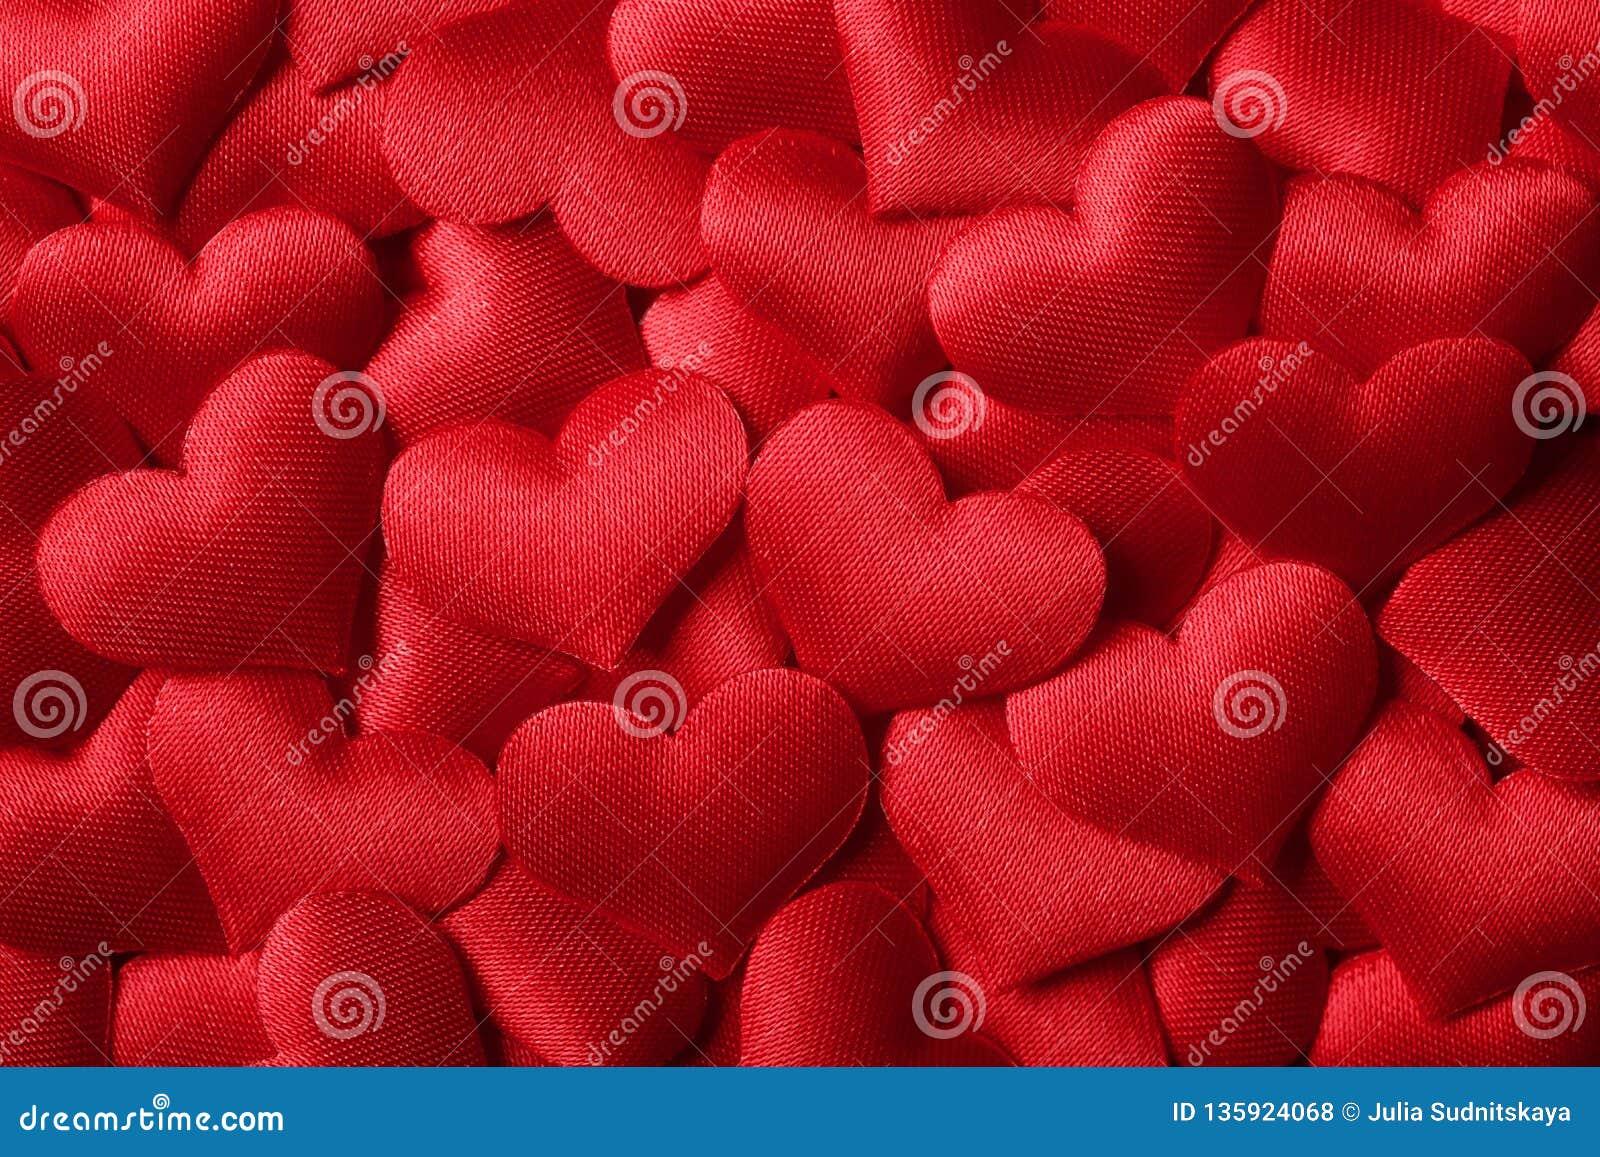 Предпосылка дня Валентайн с красными сердцами